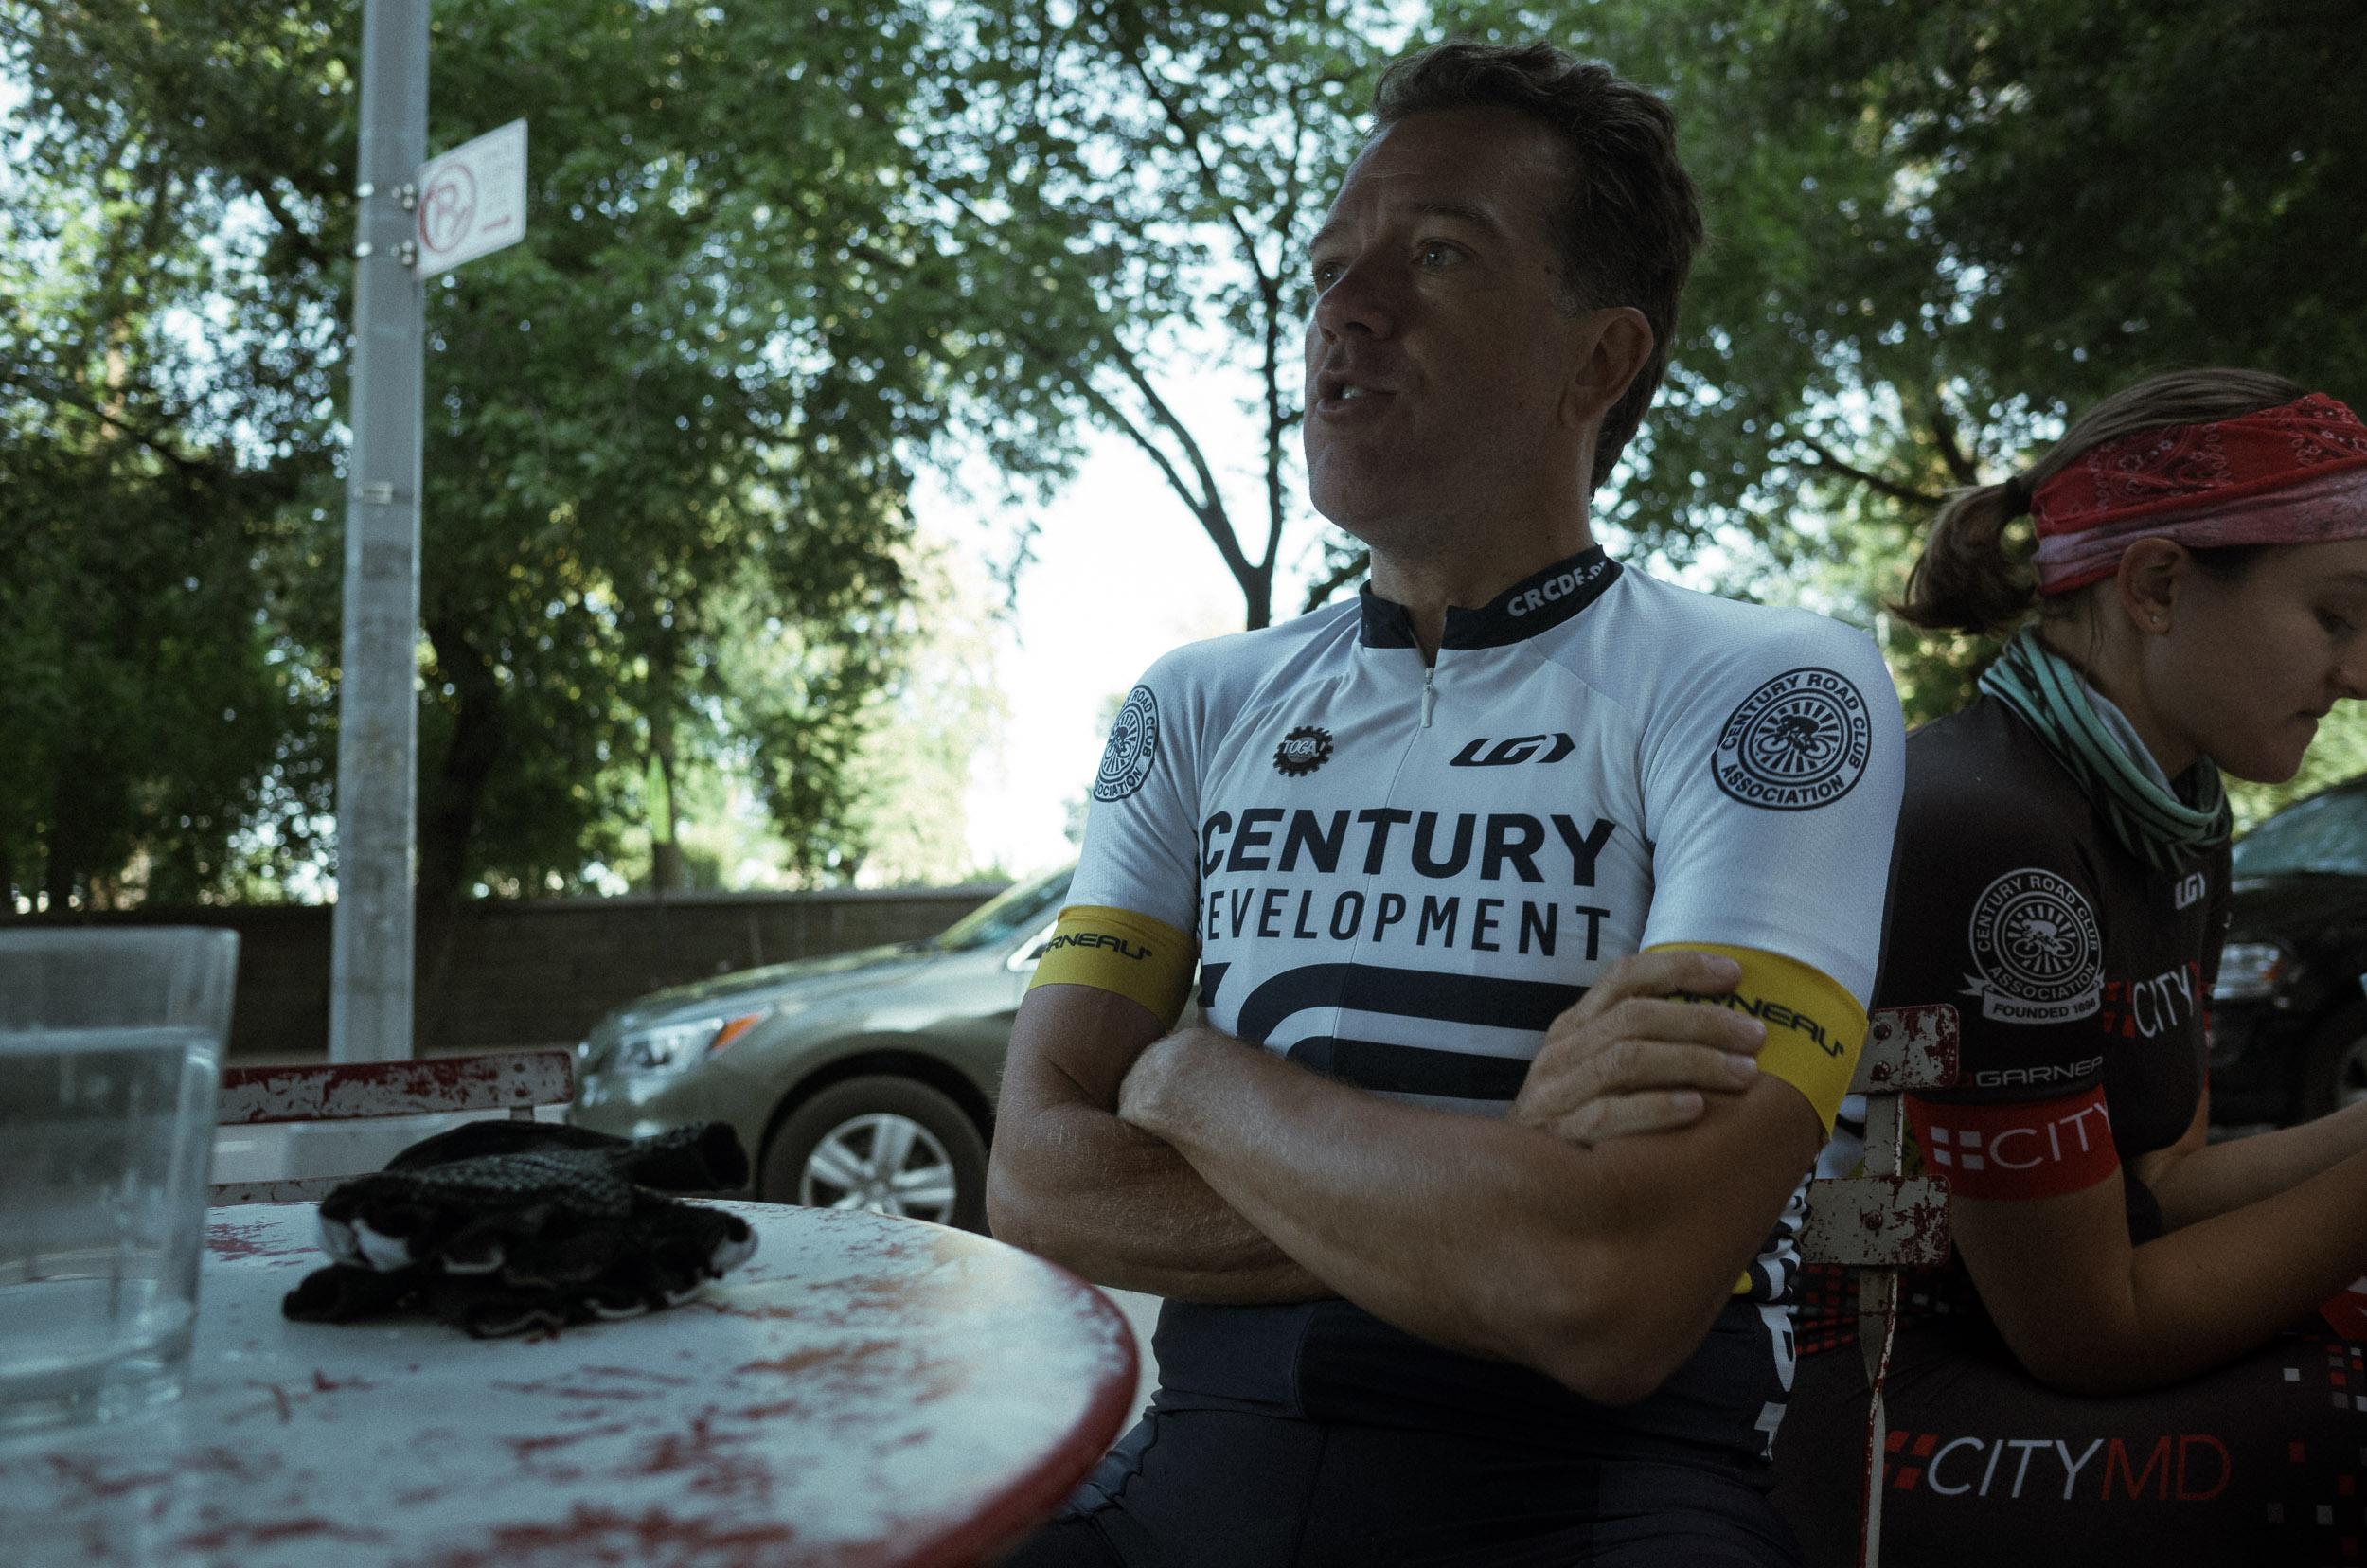 photo-rhetoric-to-be-determined-crca-club-race-127.jpg